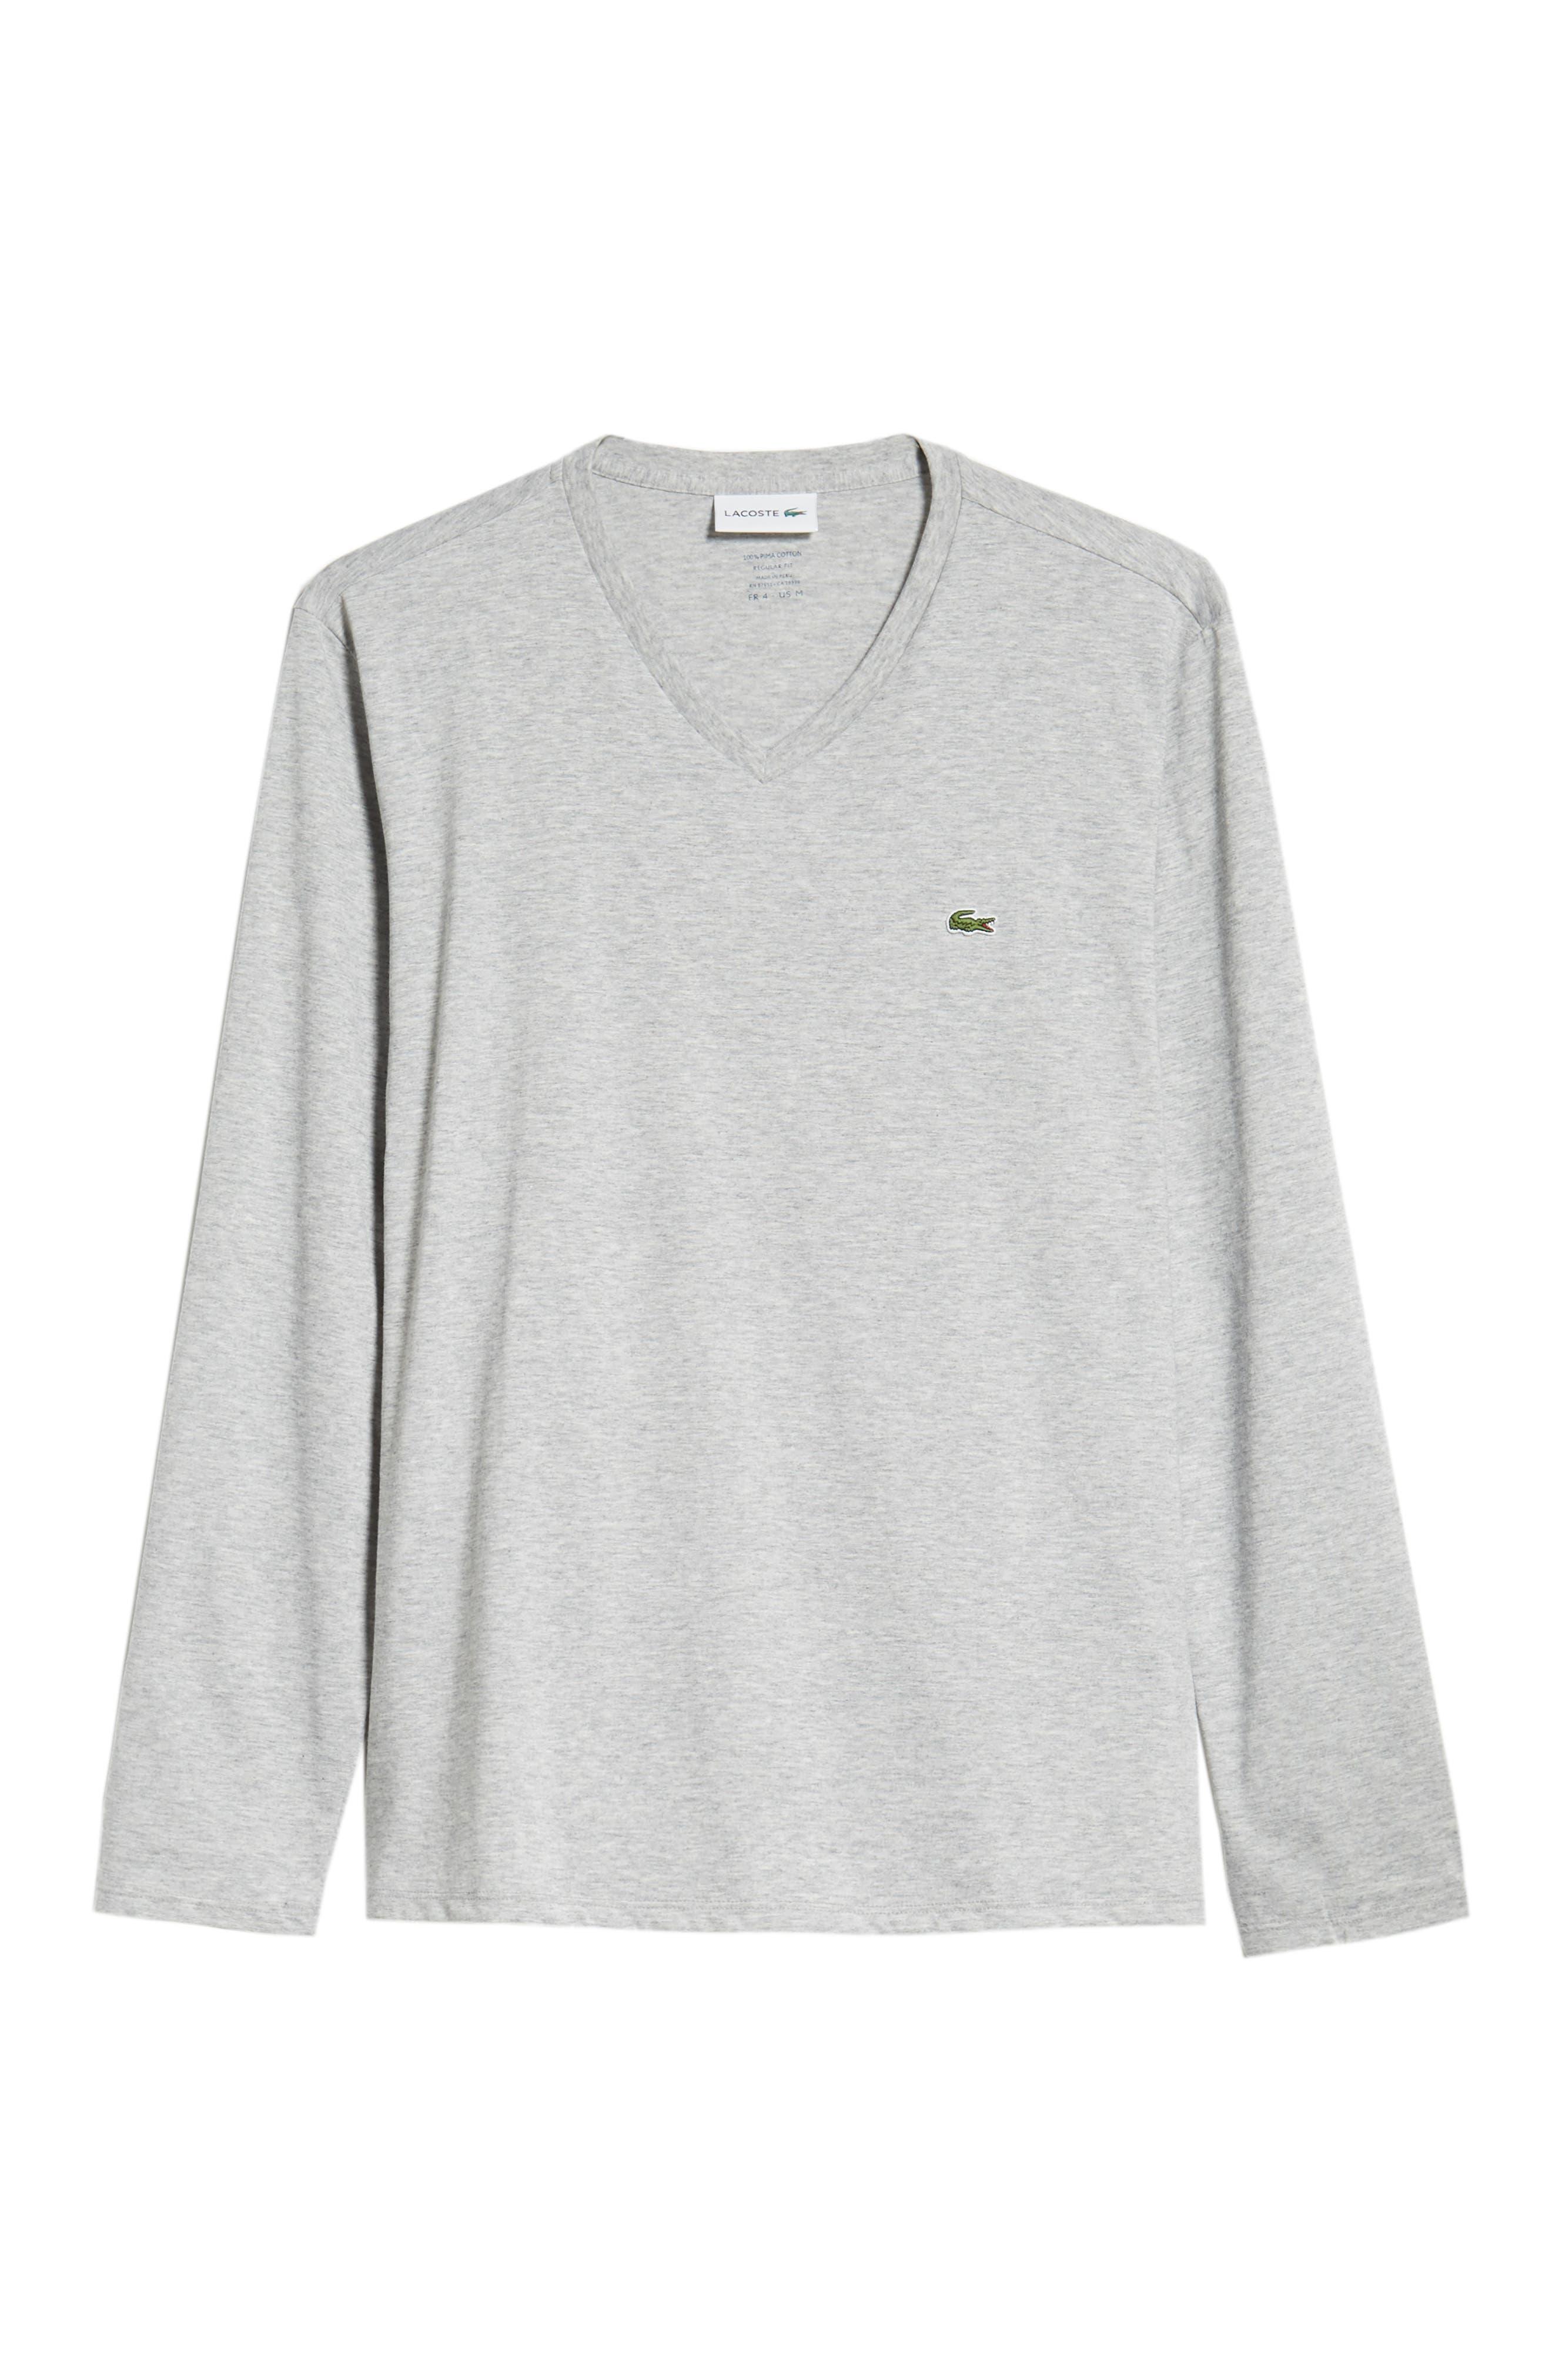 Long Sleeve T-Shirt,                             Alternate thumbnail 6, color,                             SILVER CHINE